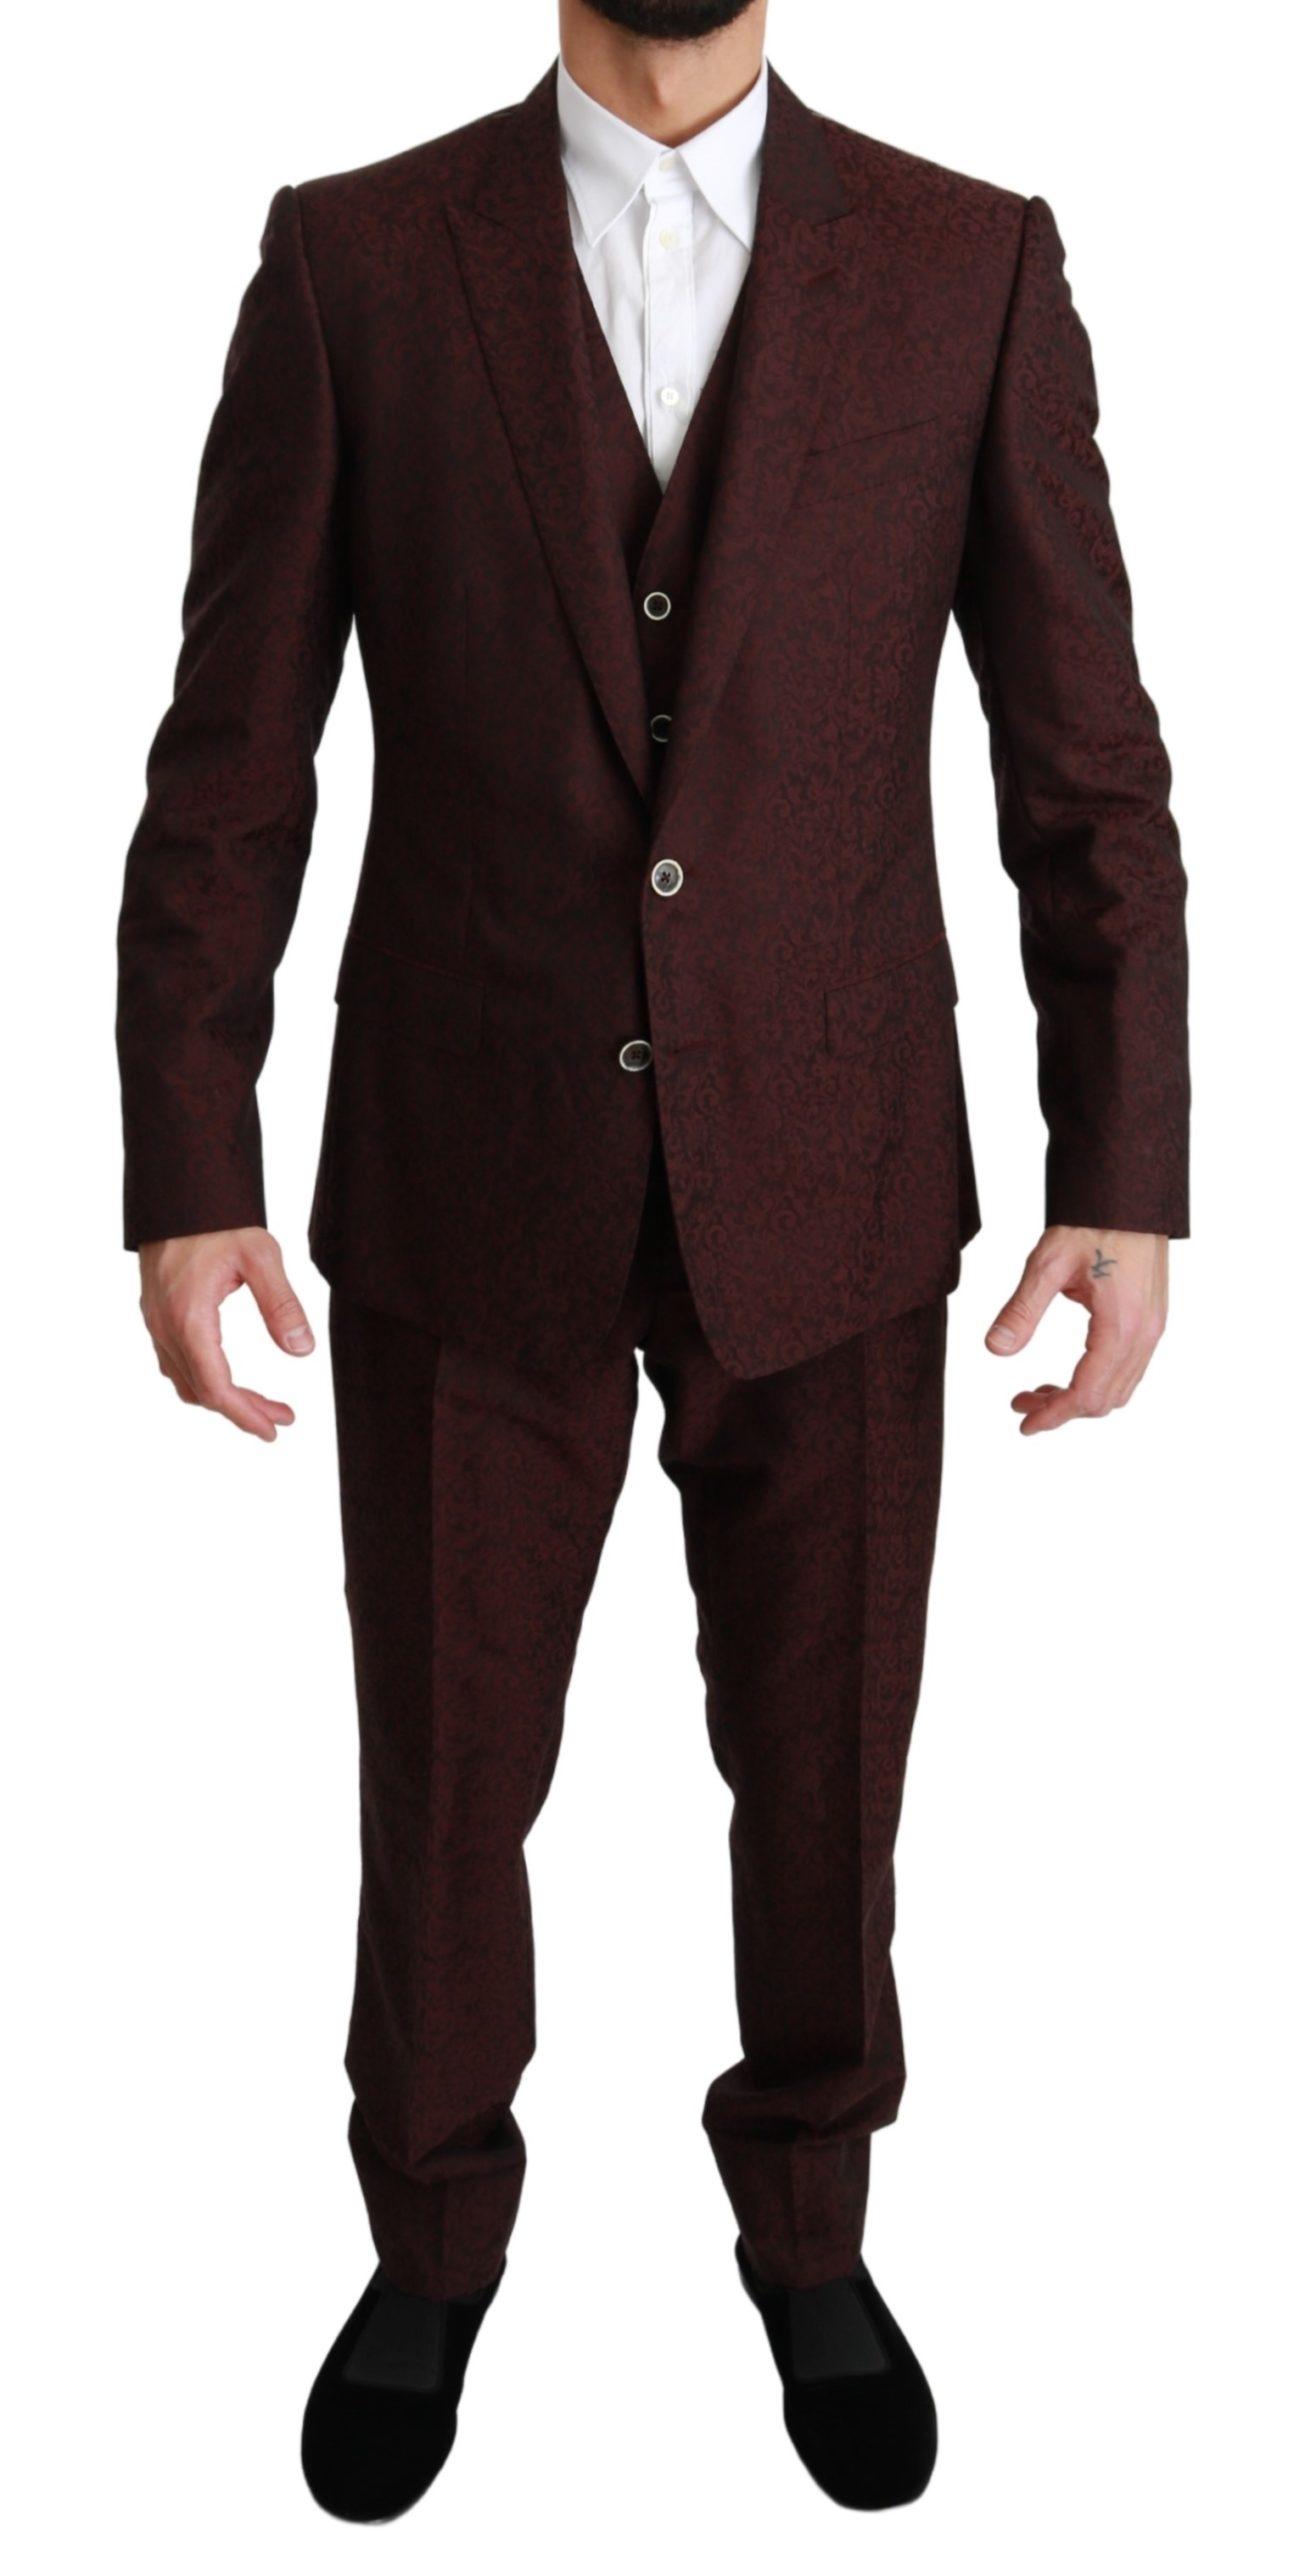 Dolce & Gabbana Men's Brocade 3 Piece Wool MARTINI Suit Bordeaux KOS1629 - IT50 | L